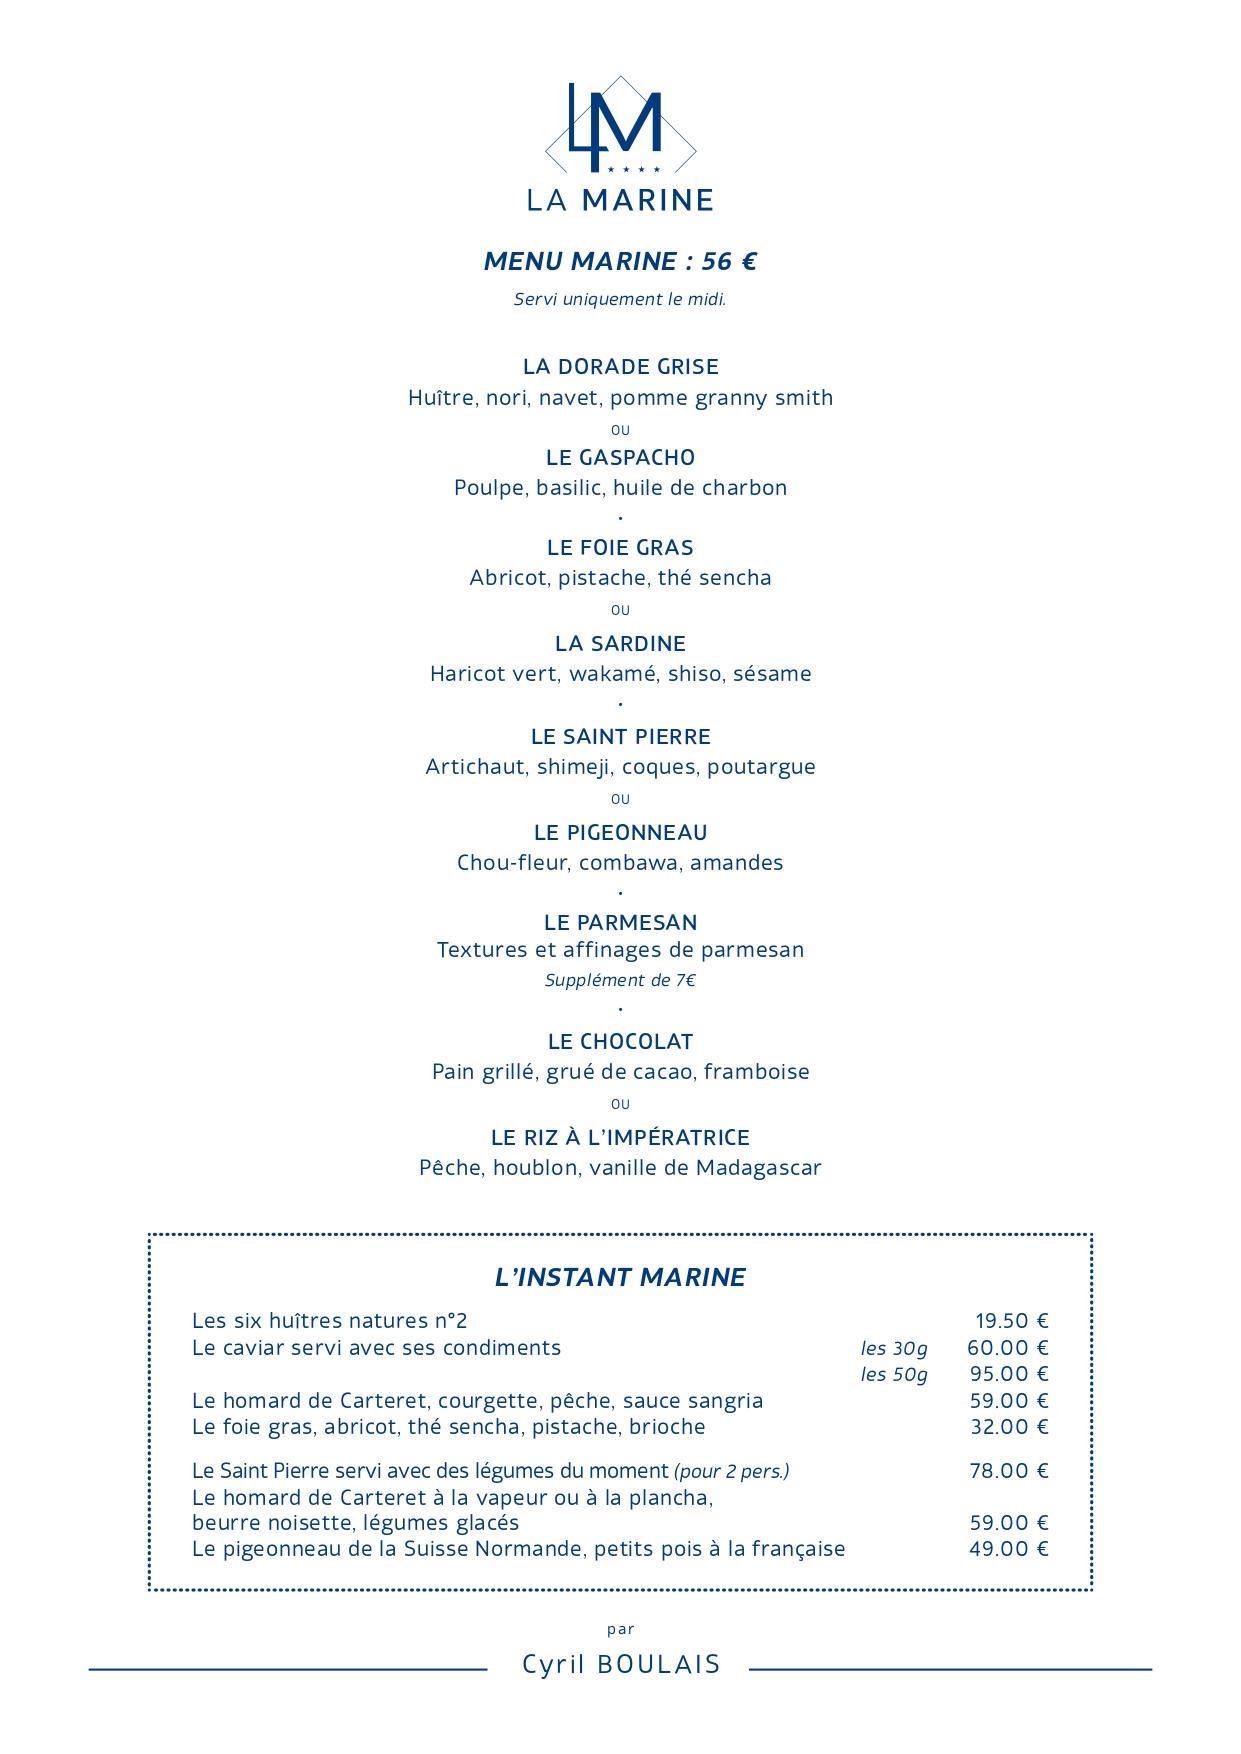 menusA4portraitLM-26Juillet2021 56